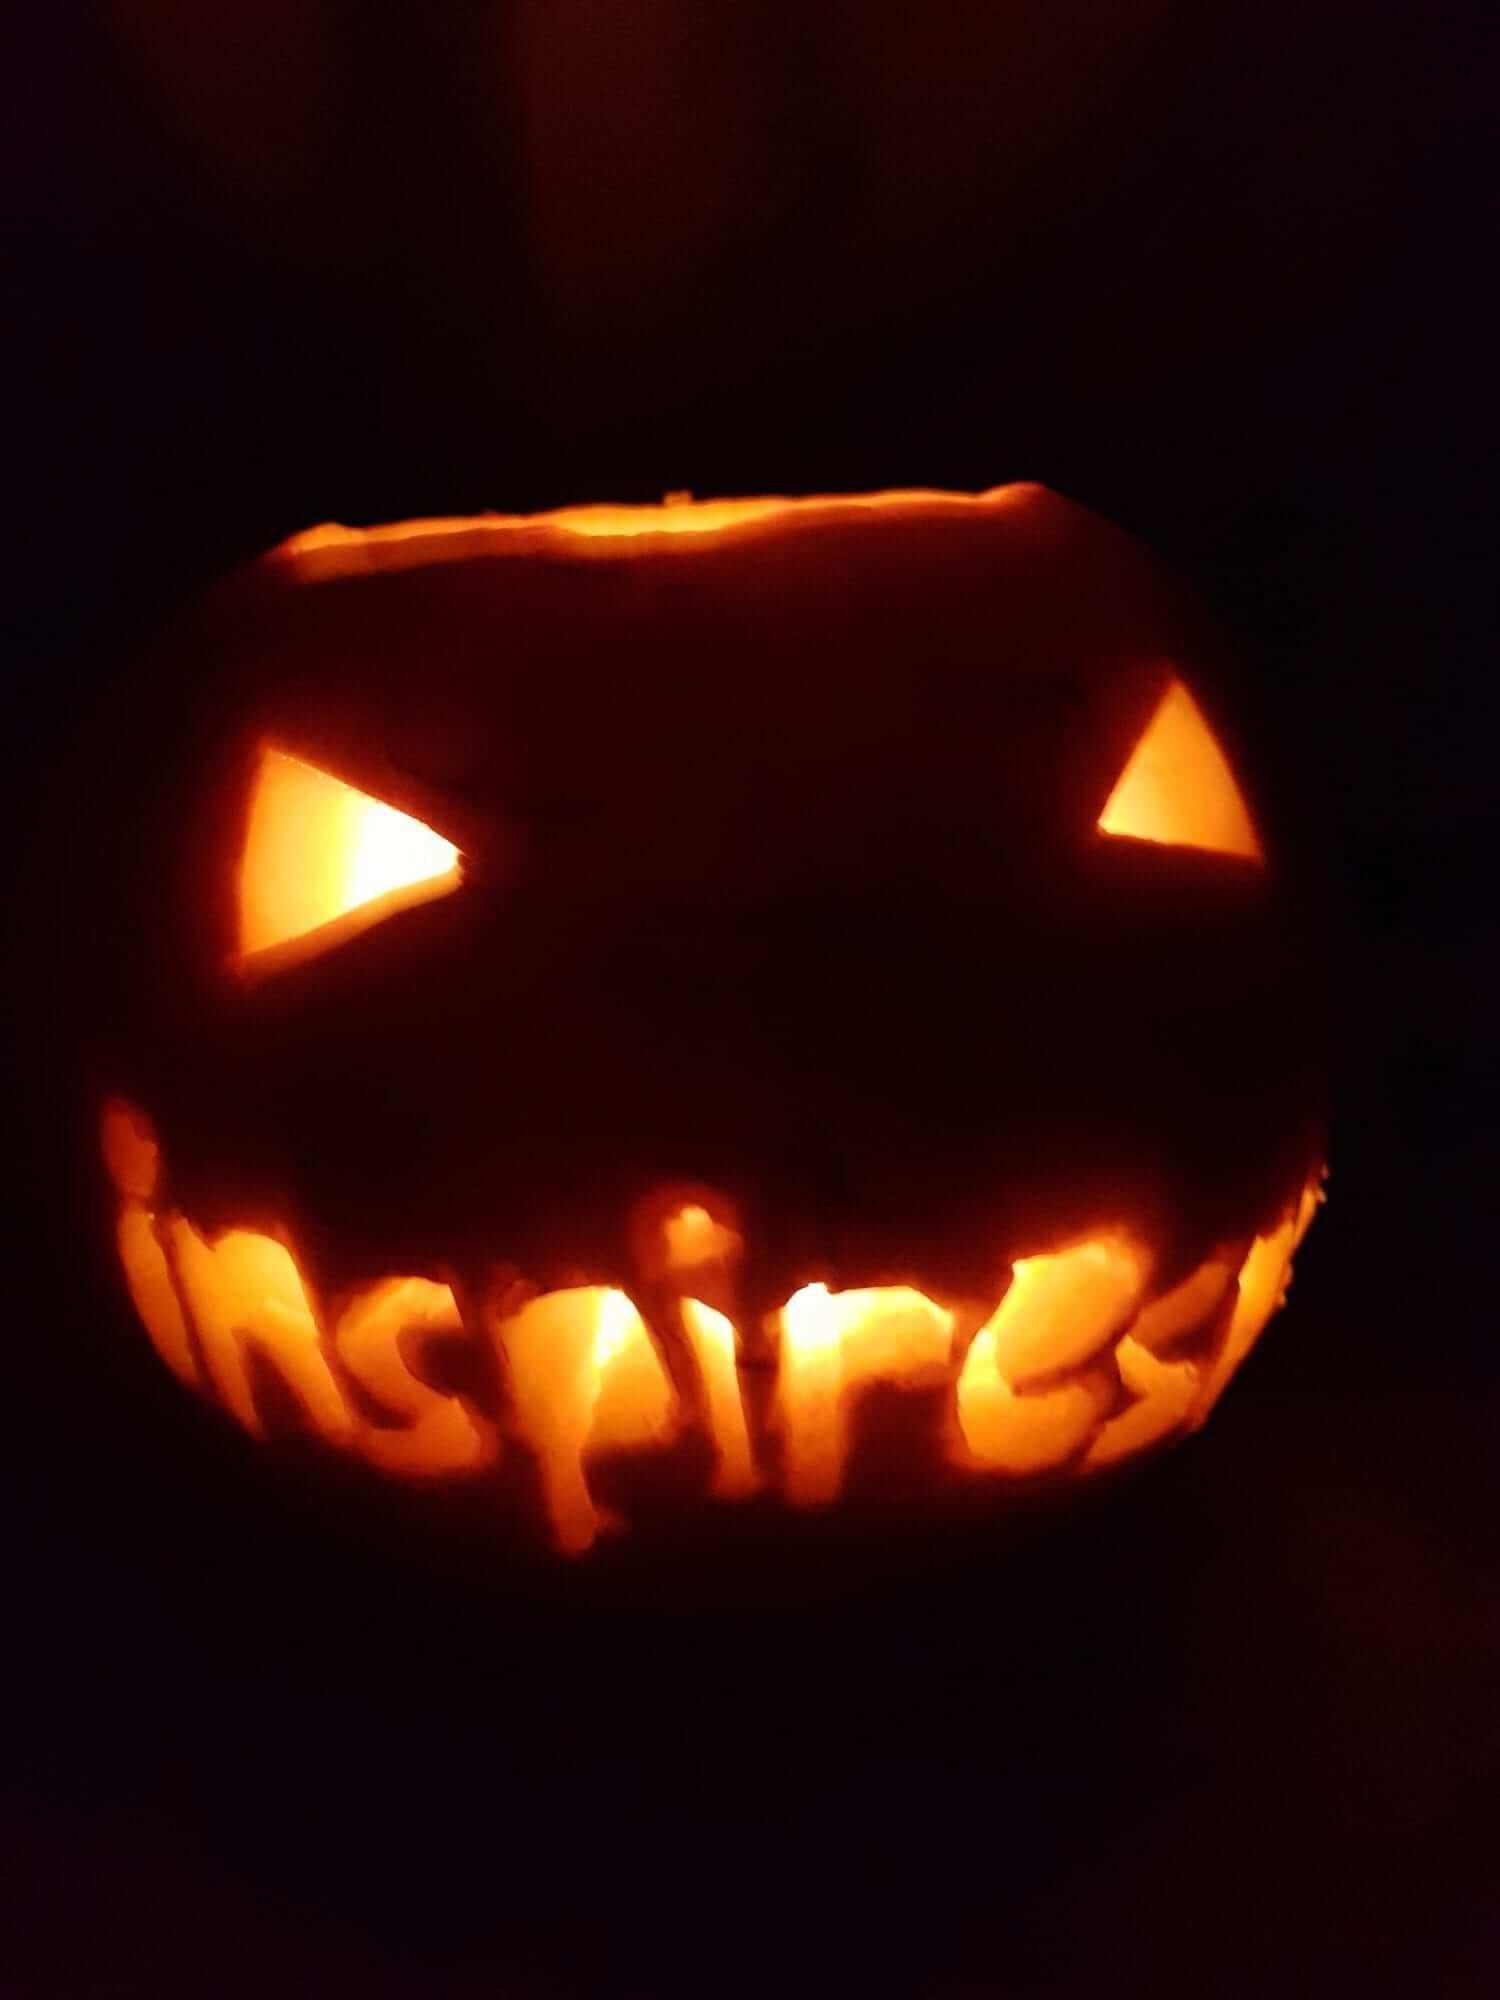 inspiresport October